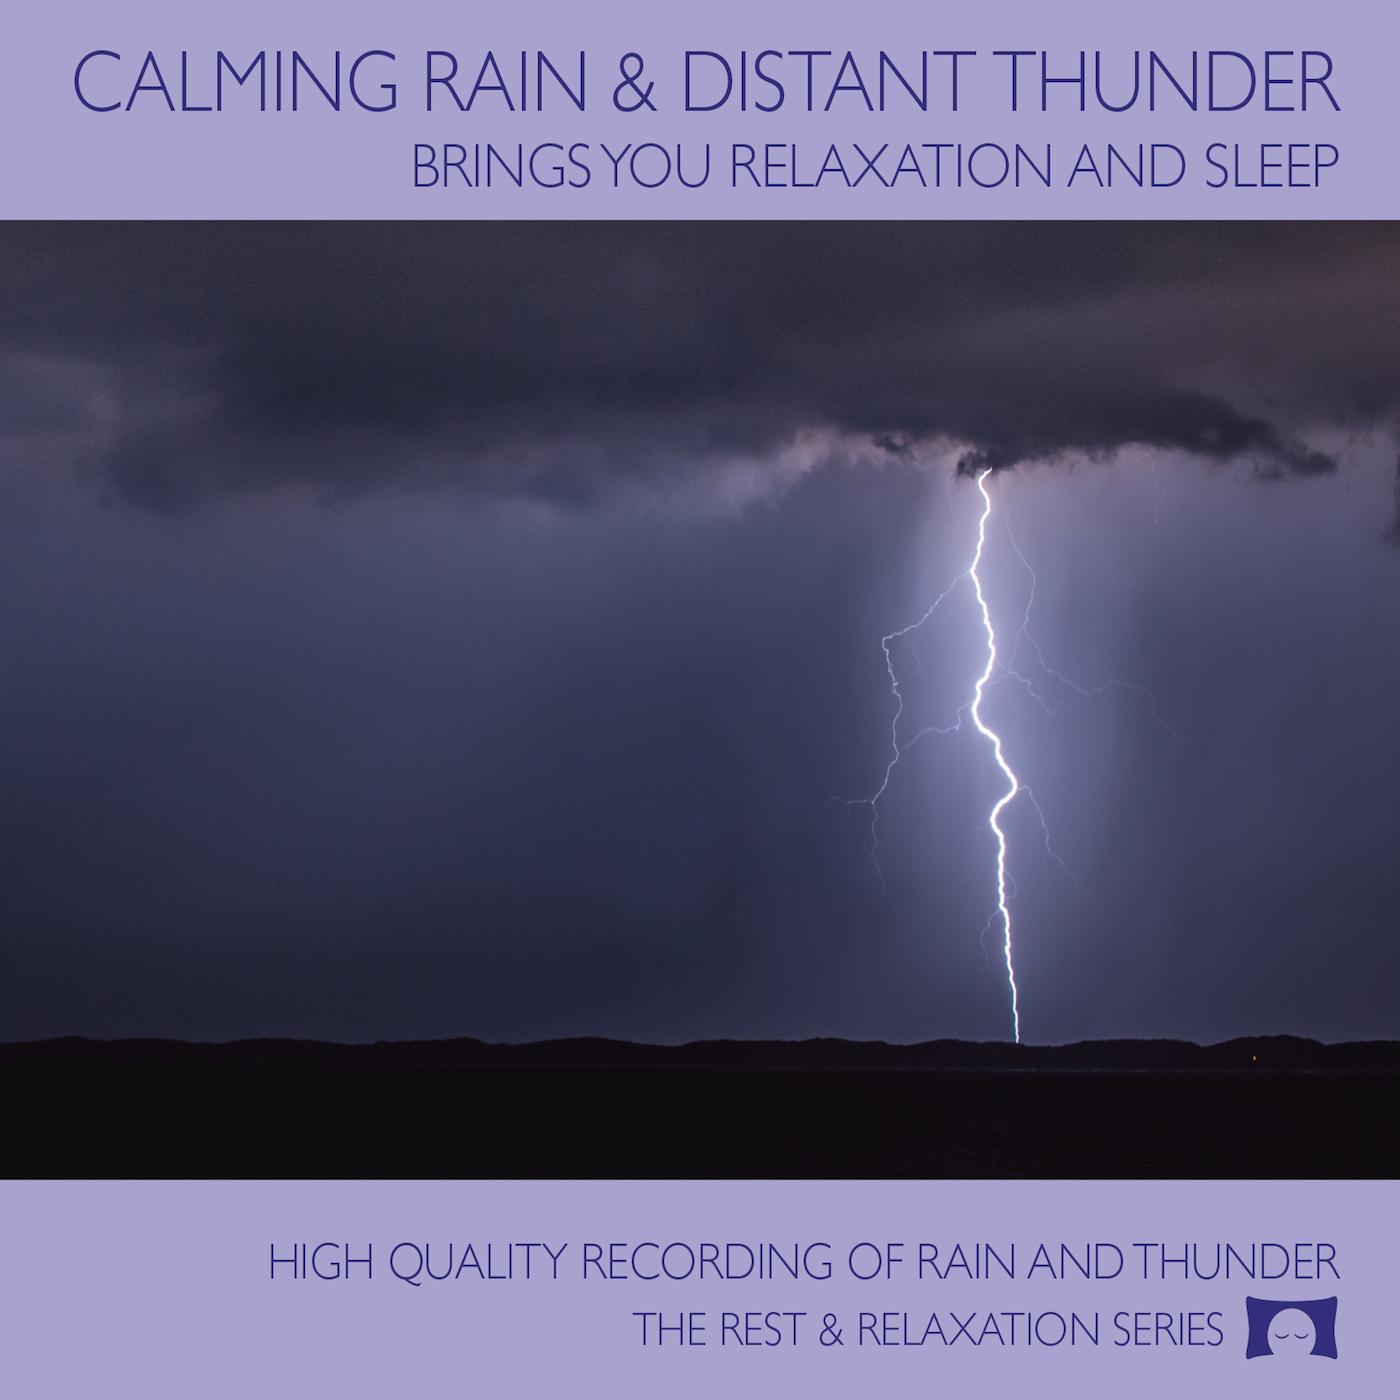 1400 x 1400 rhythmtree-calmingrainandthu